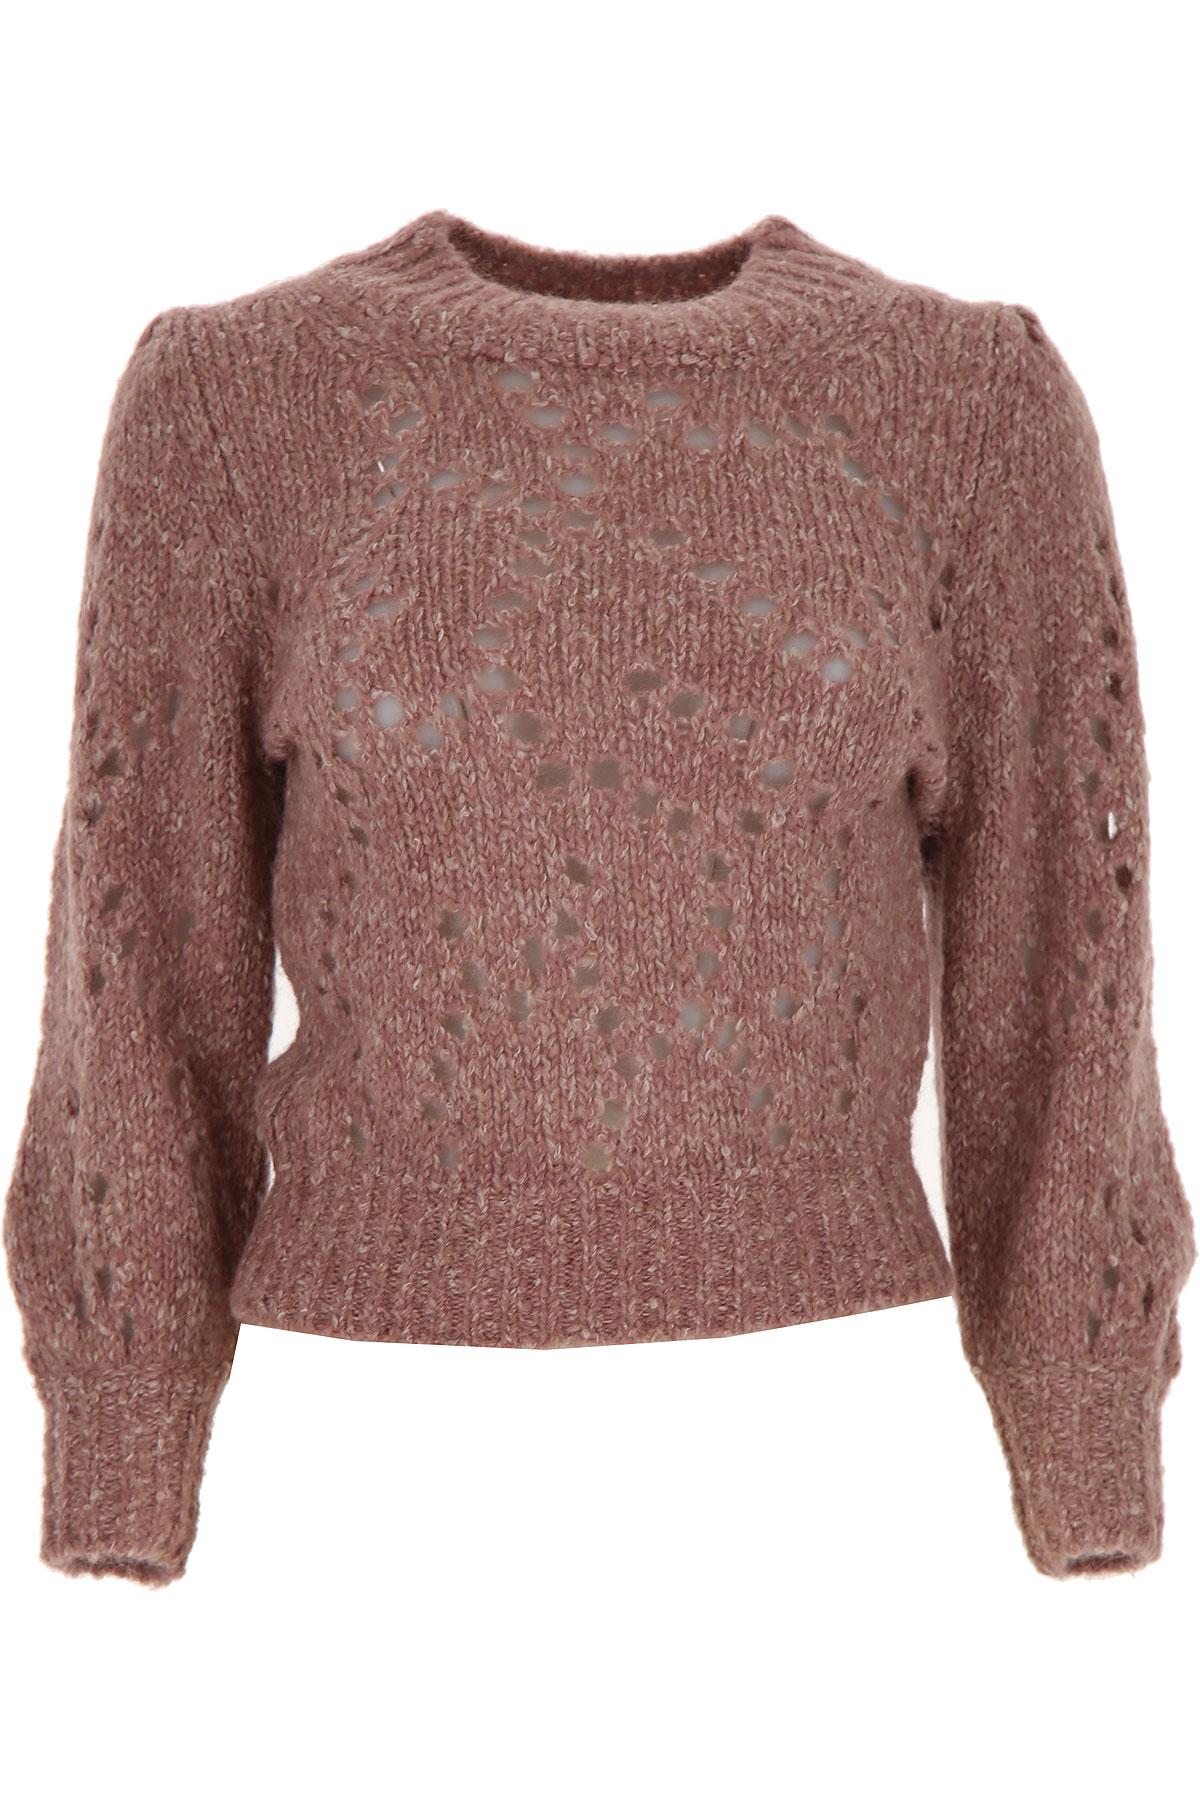 Isabel Marant Sweater for Women Jumper On Sale, Rosewood, alpaca, 2019, 6 8